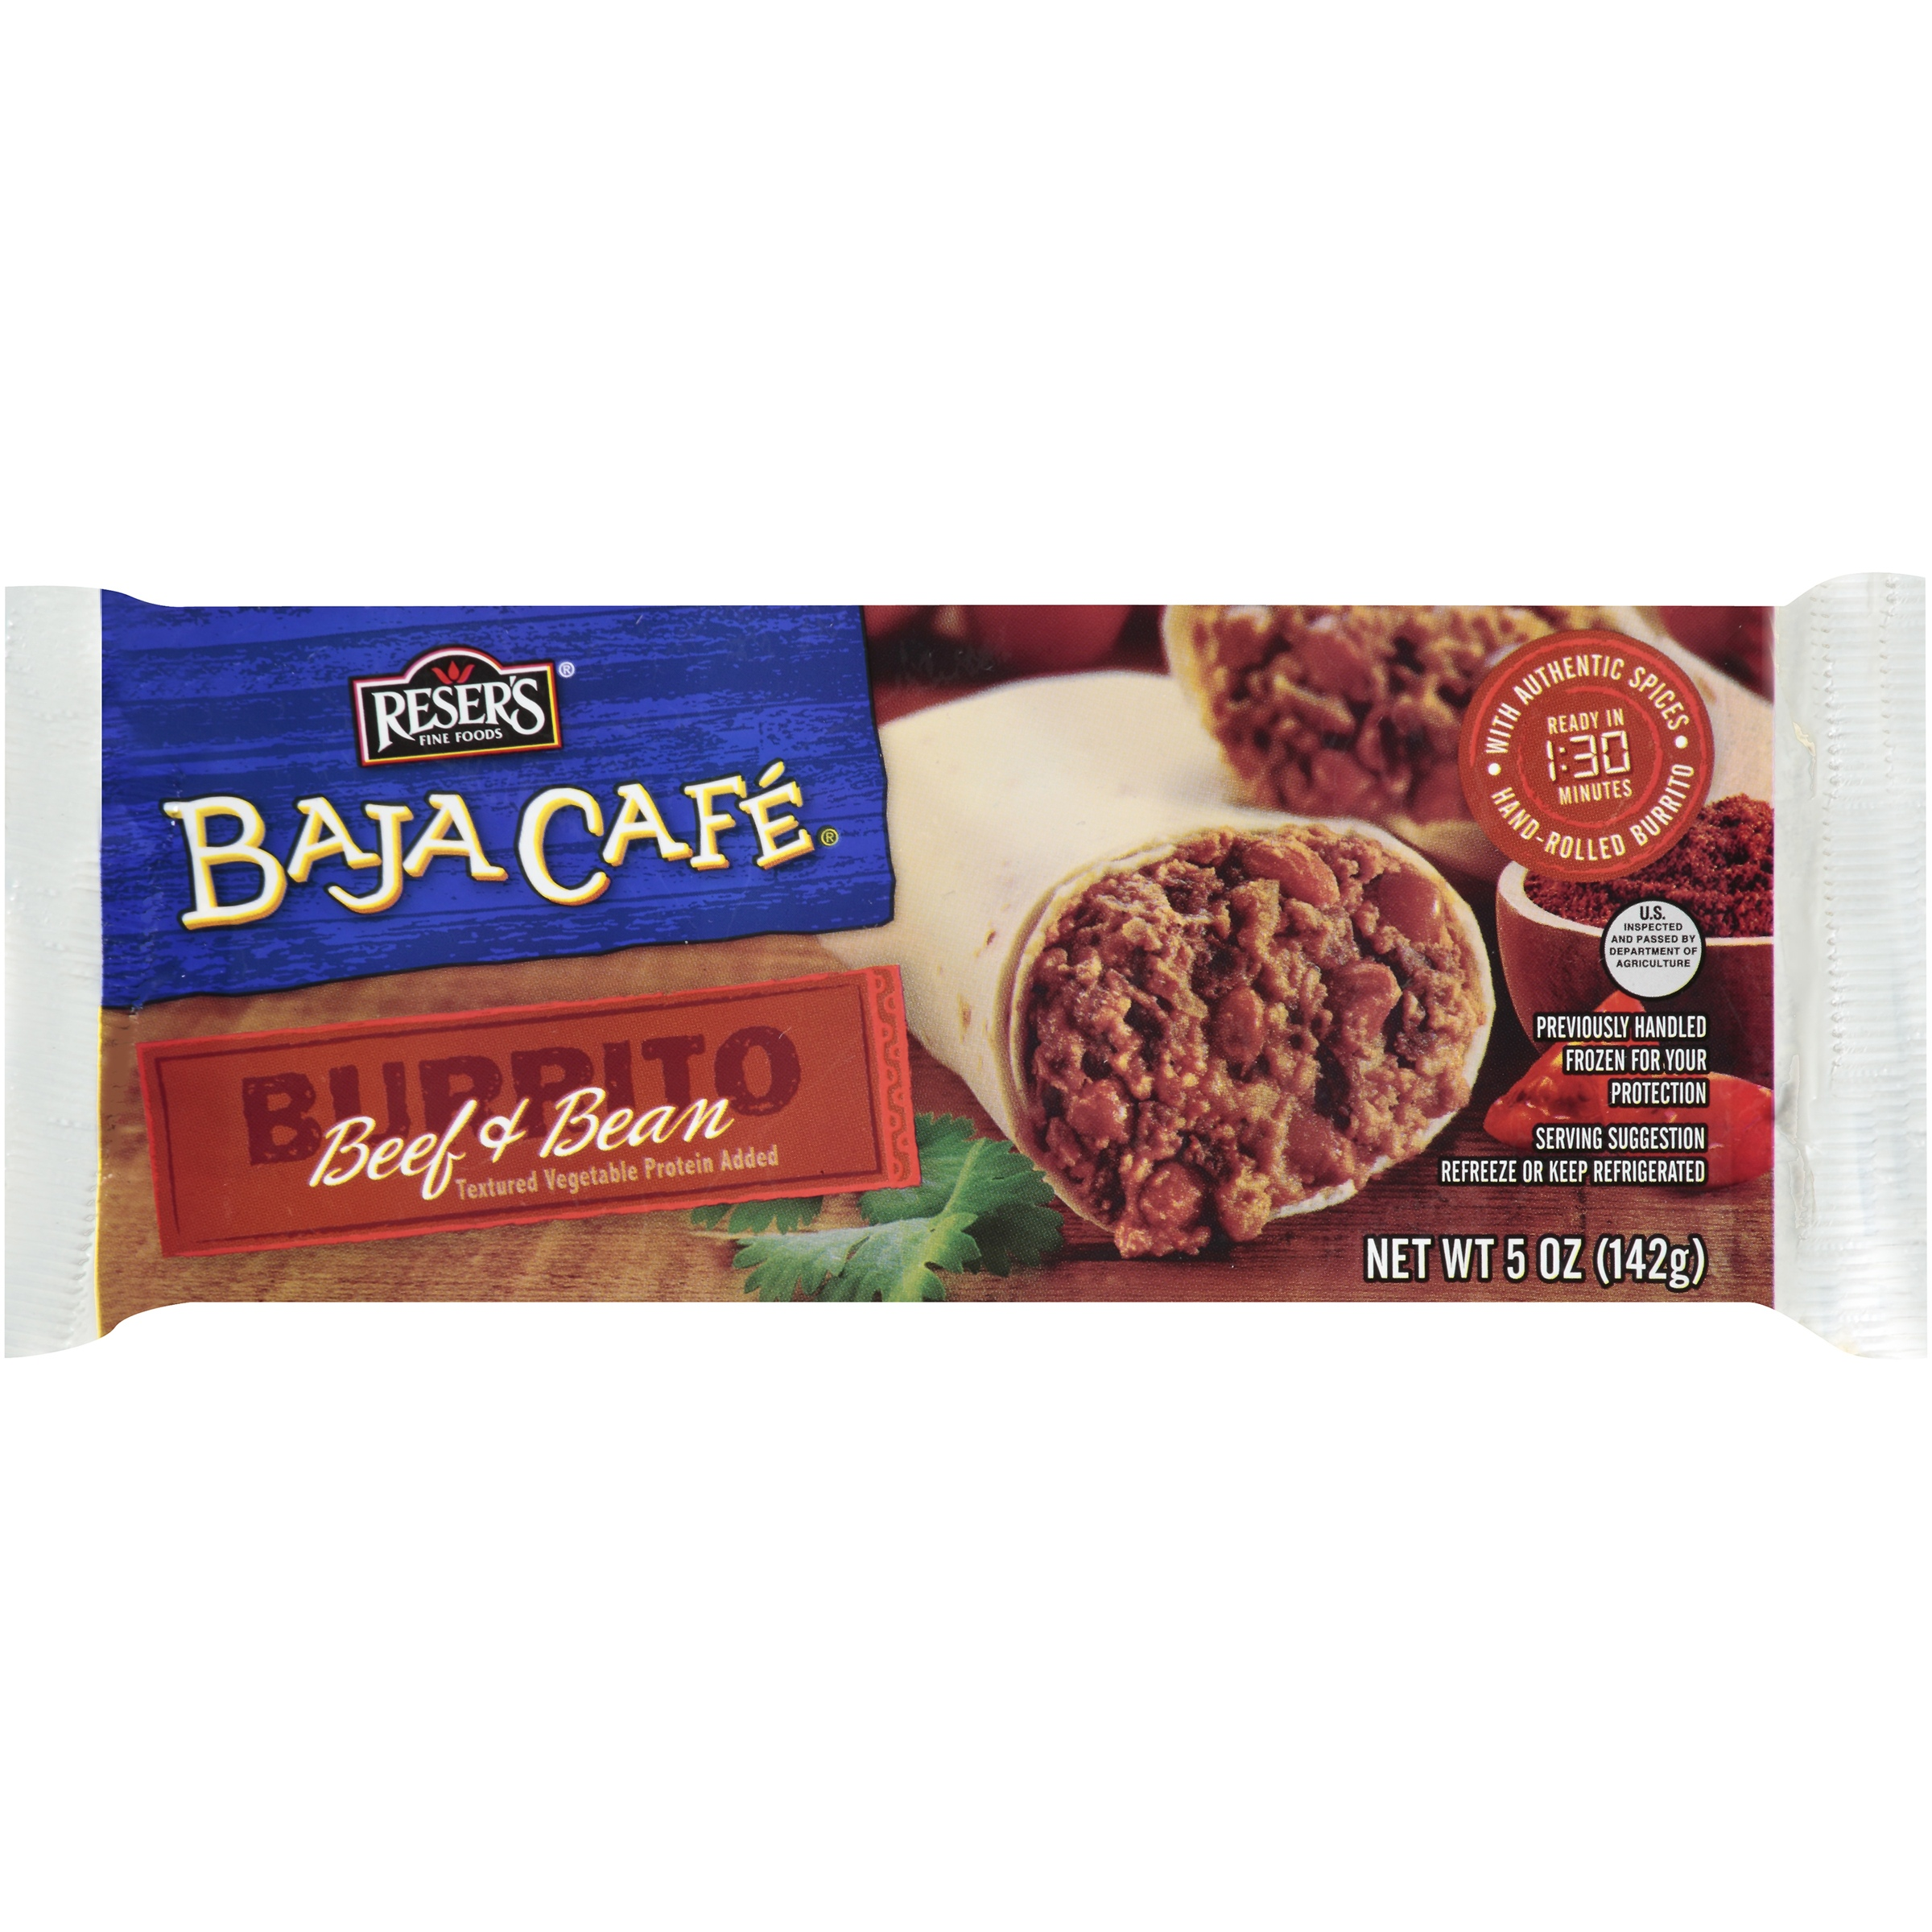 Baja Cafe® Beef & Bean Burrito 5 oz.